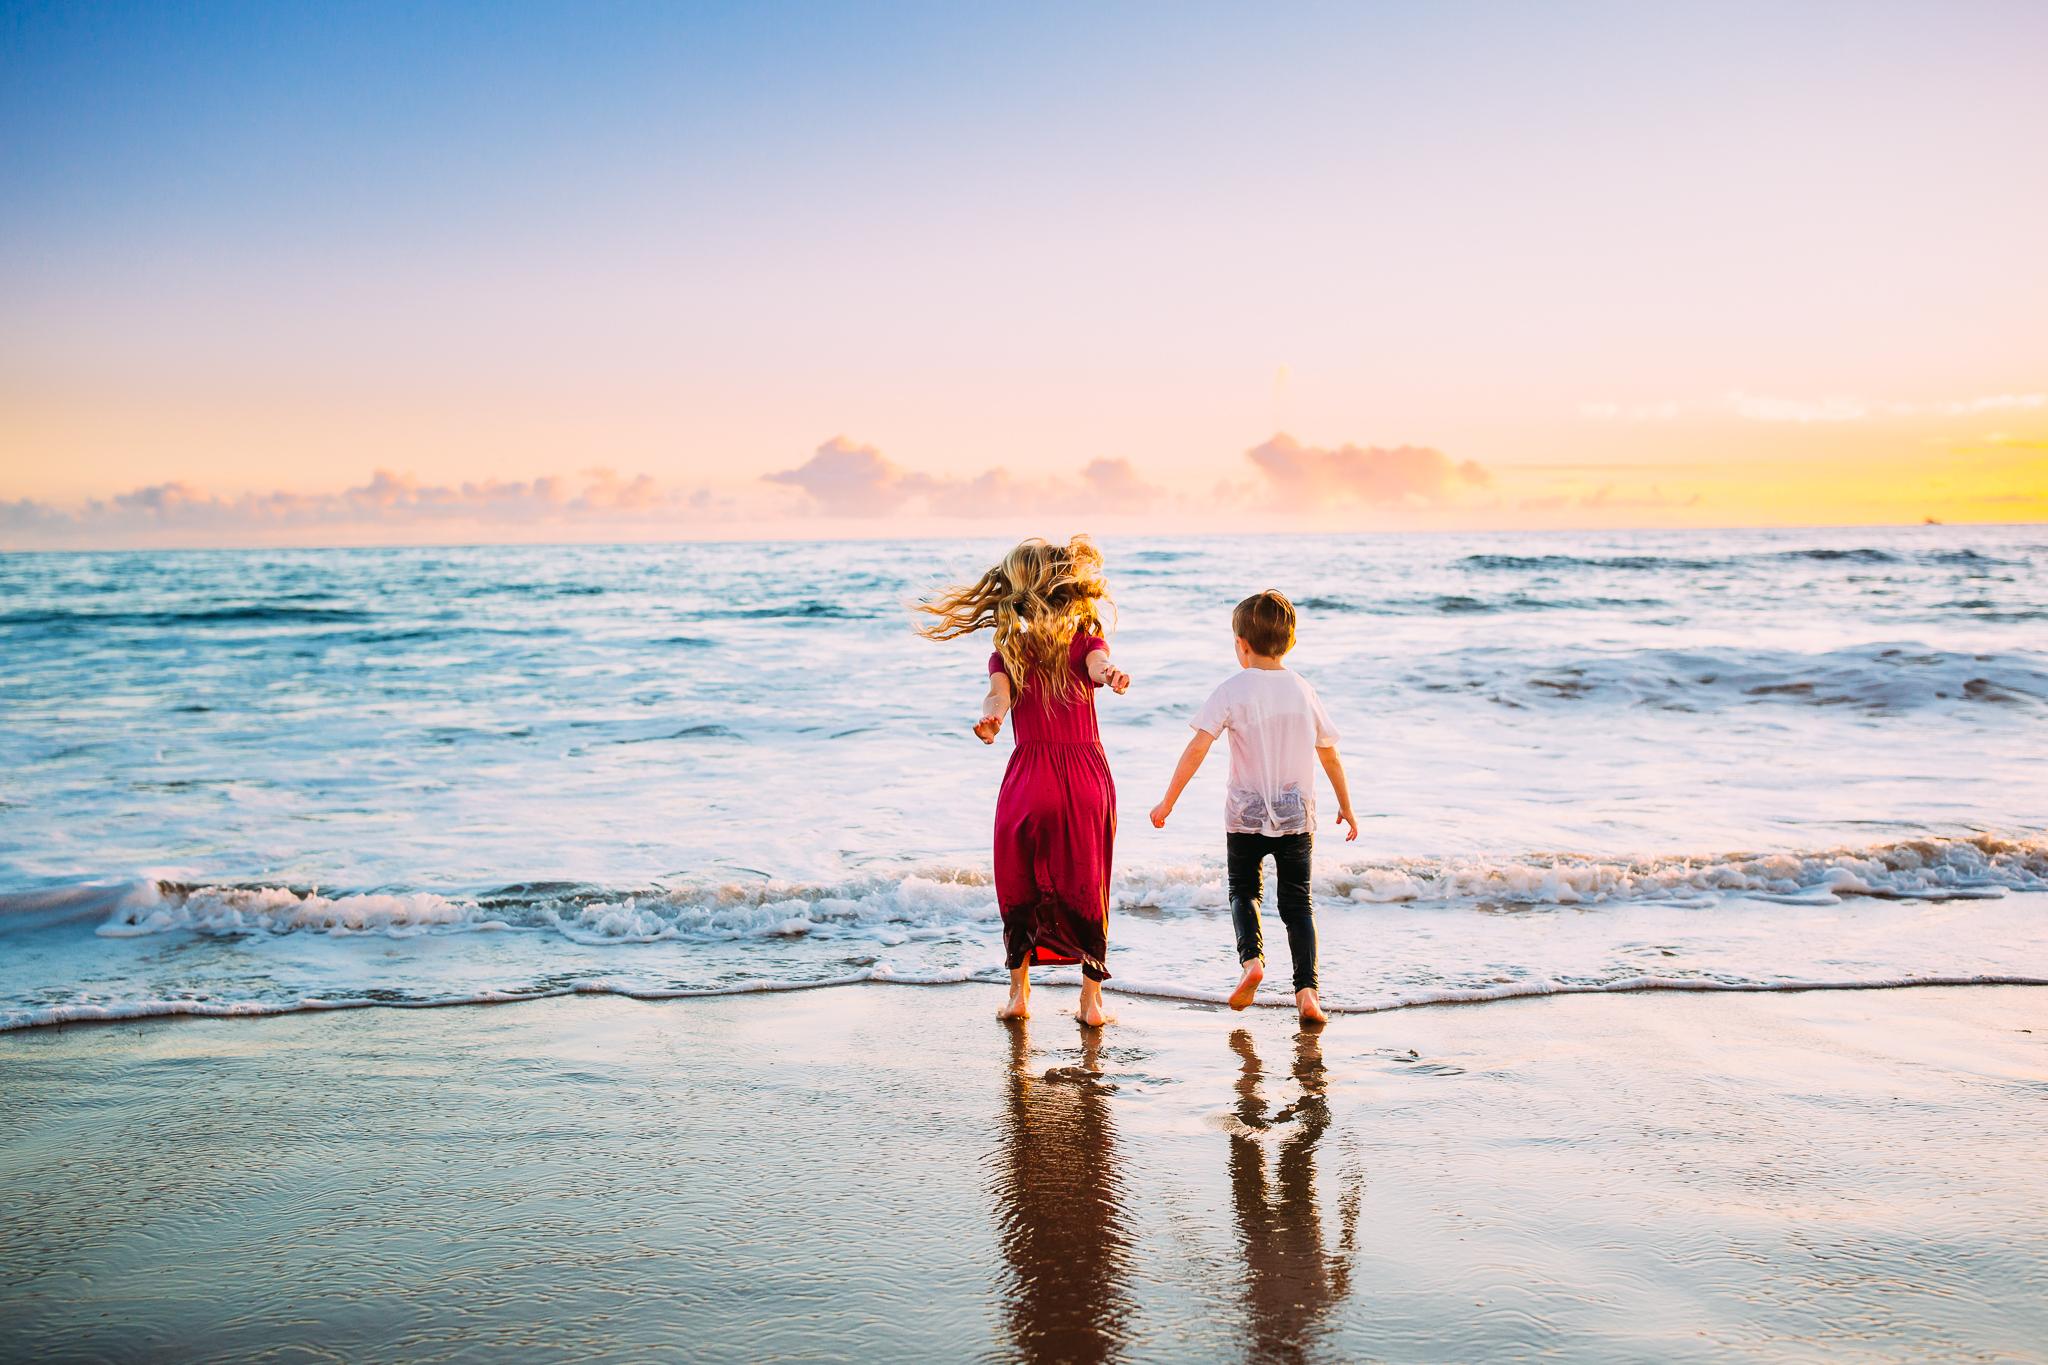 family photo session in Orange County at Newport Beach, California